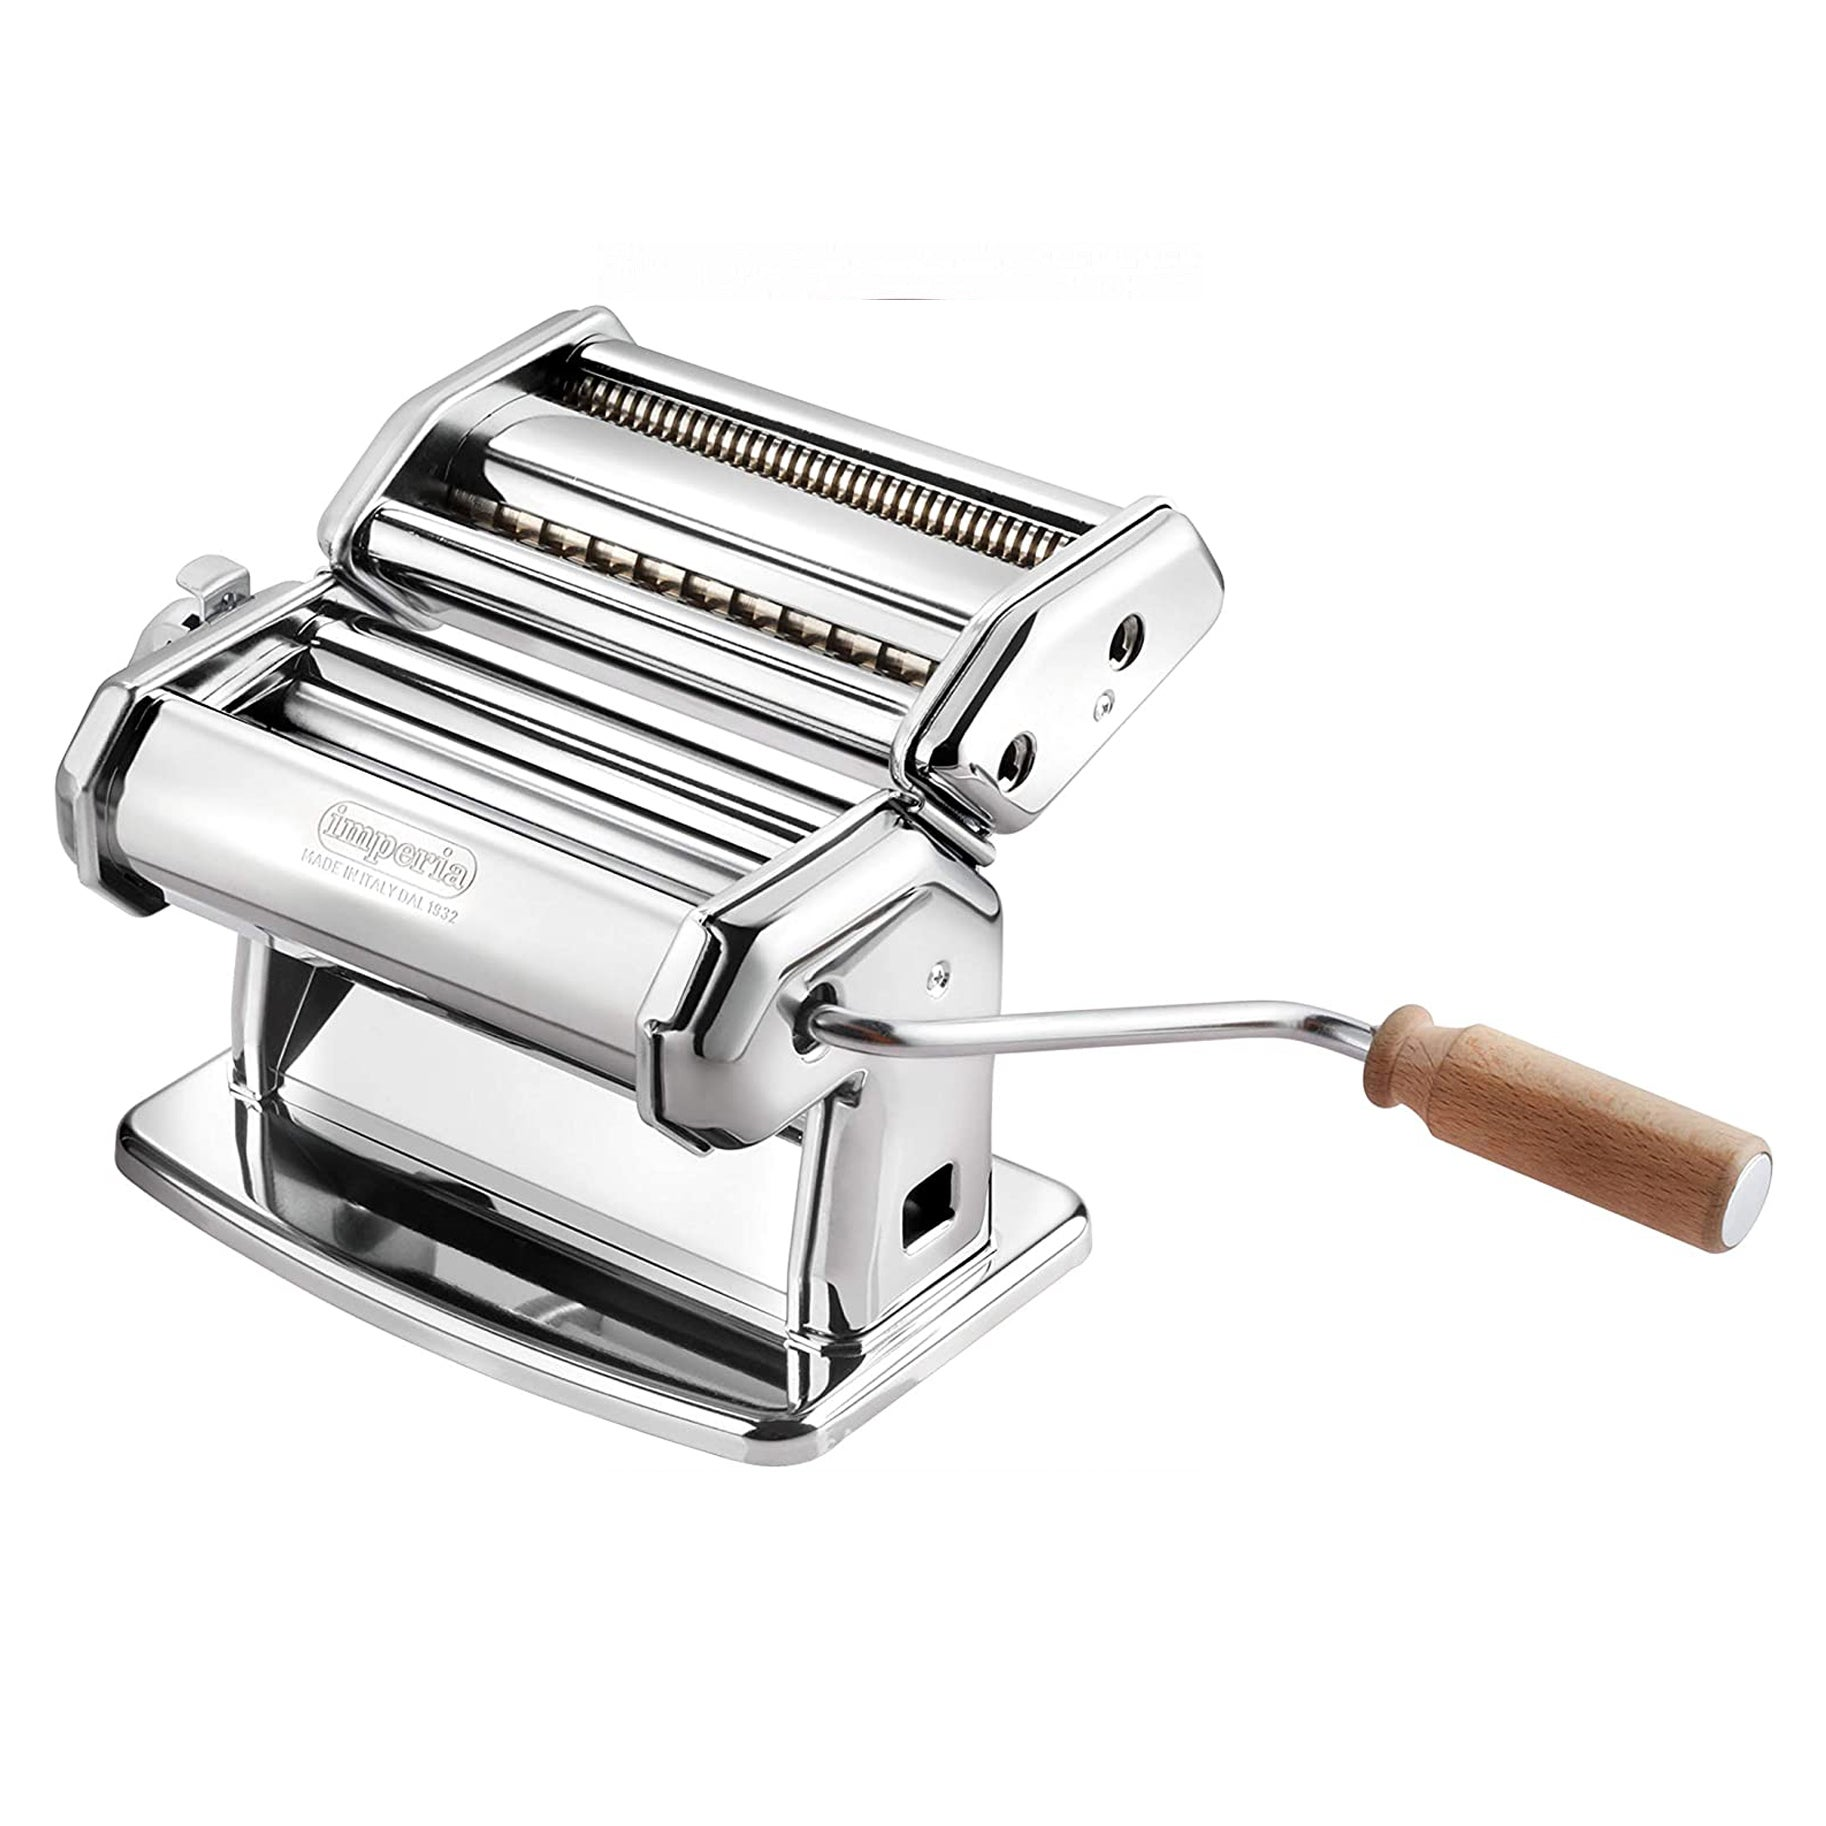 The Best Pasta Maker Option: Imperia Pasta Maker Machine